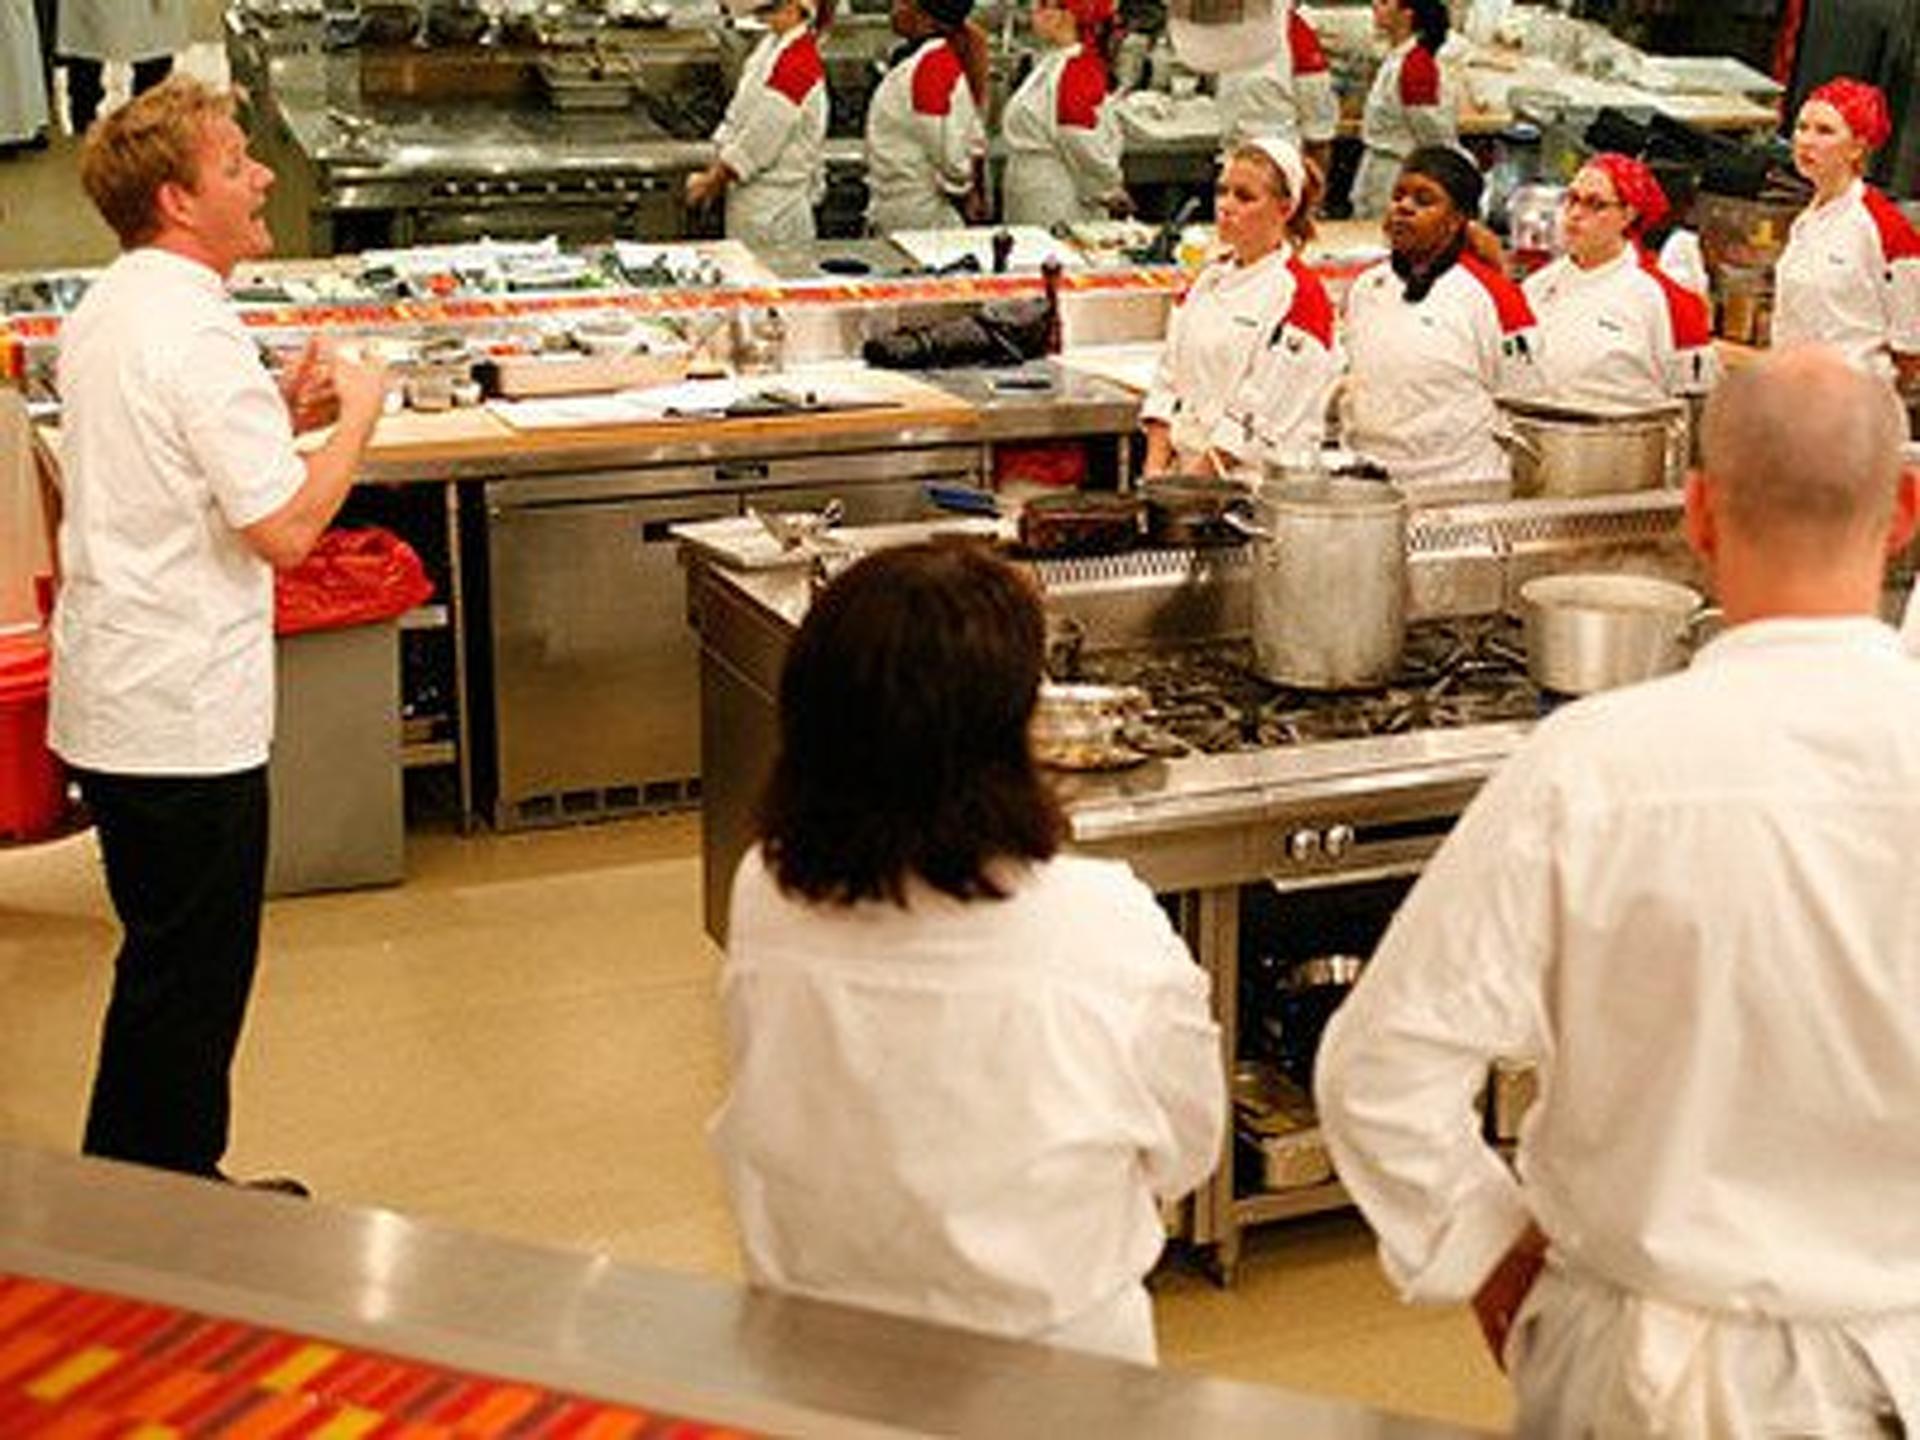 11 chefs pete summary hell s kitchen us season 4 episode 5